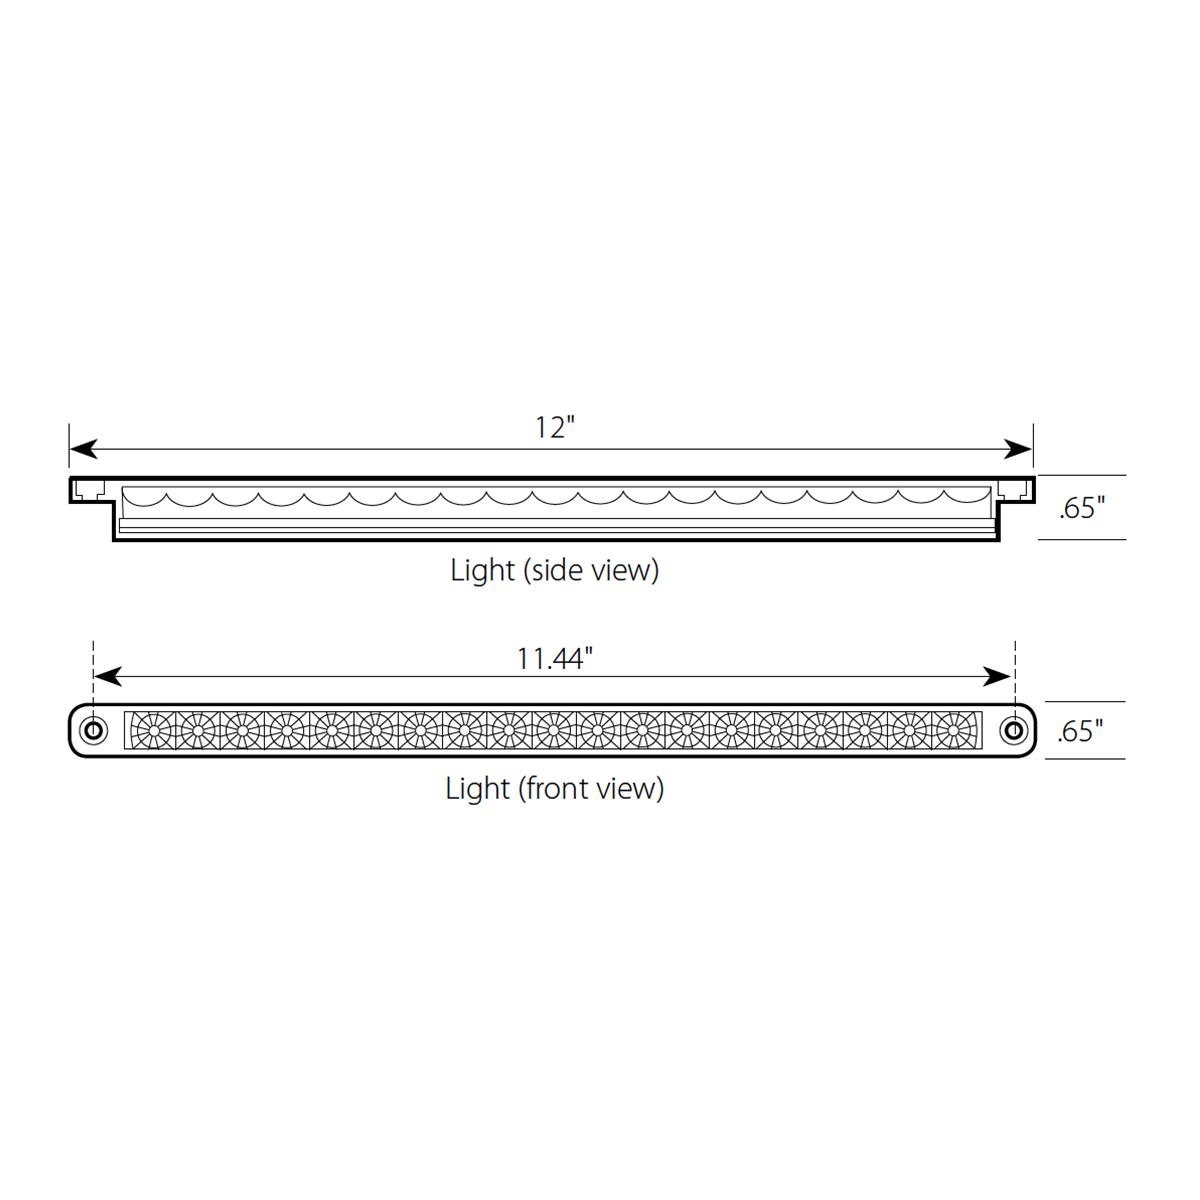 "12"" Dual Function LED Light Bar"